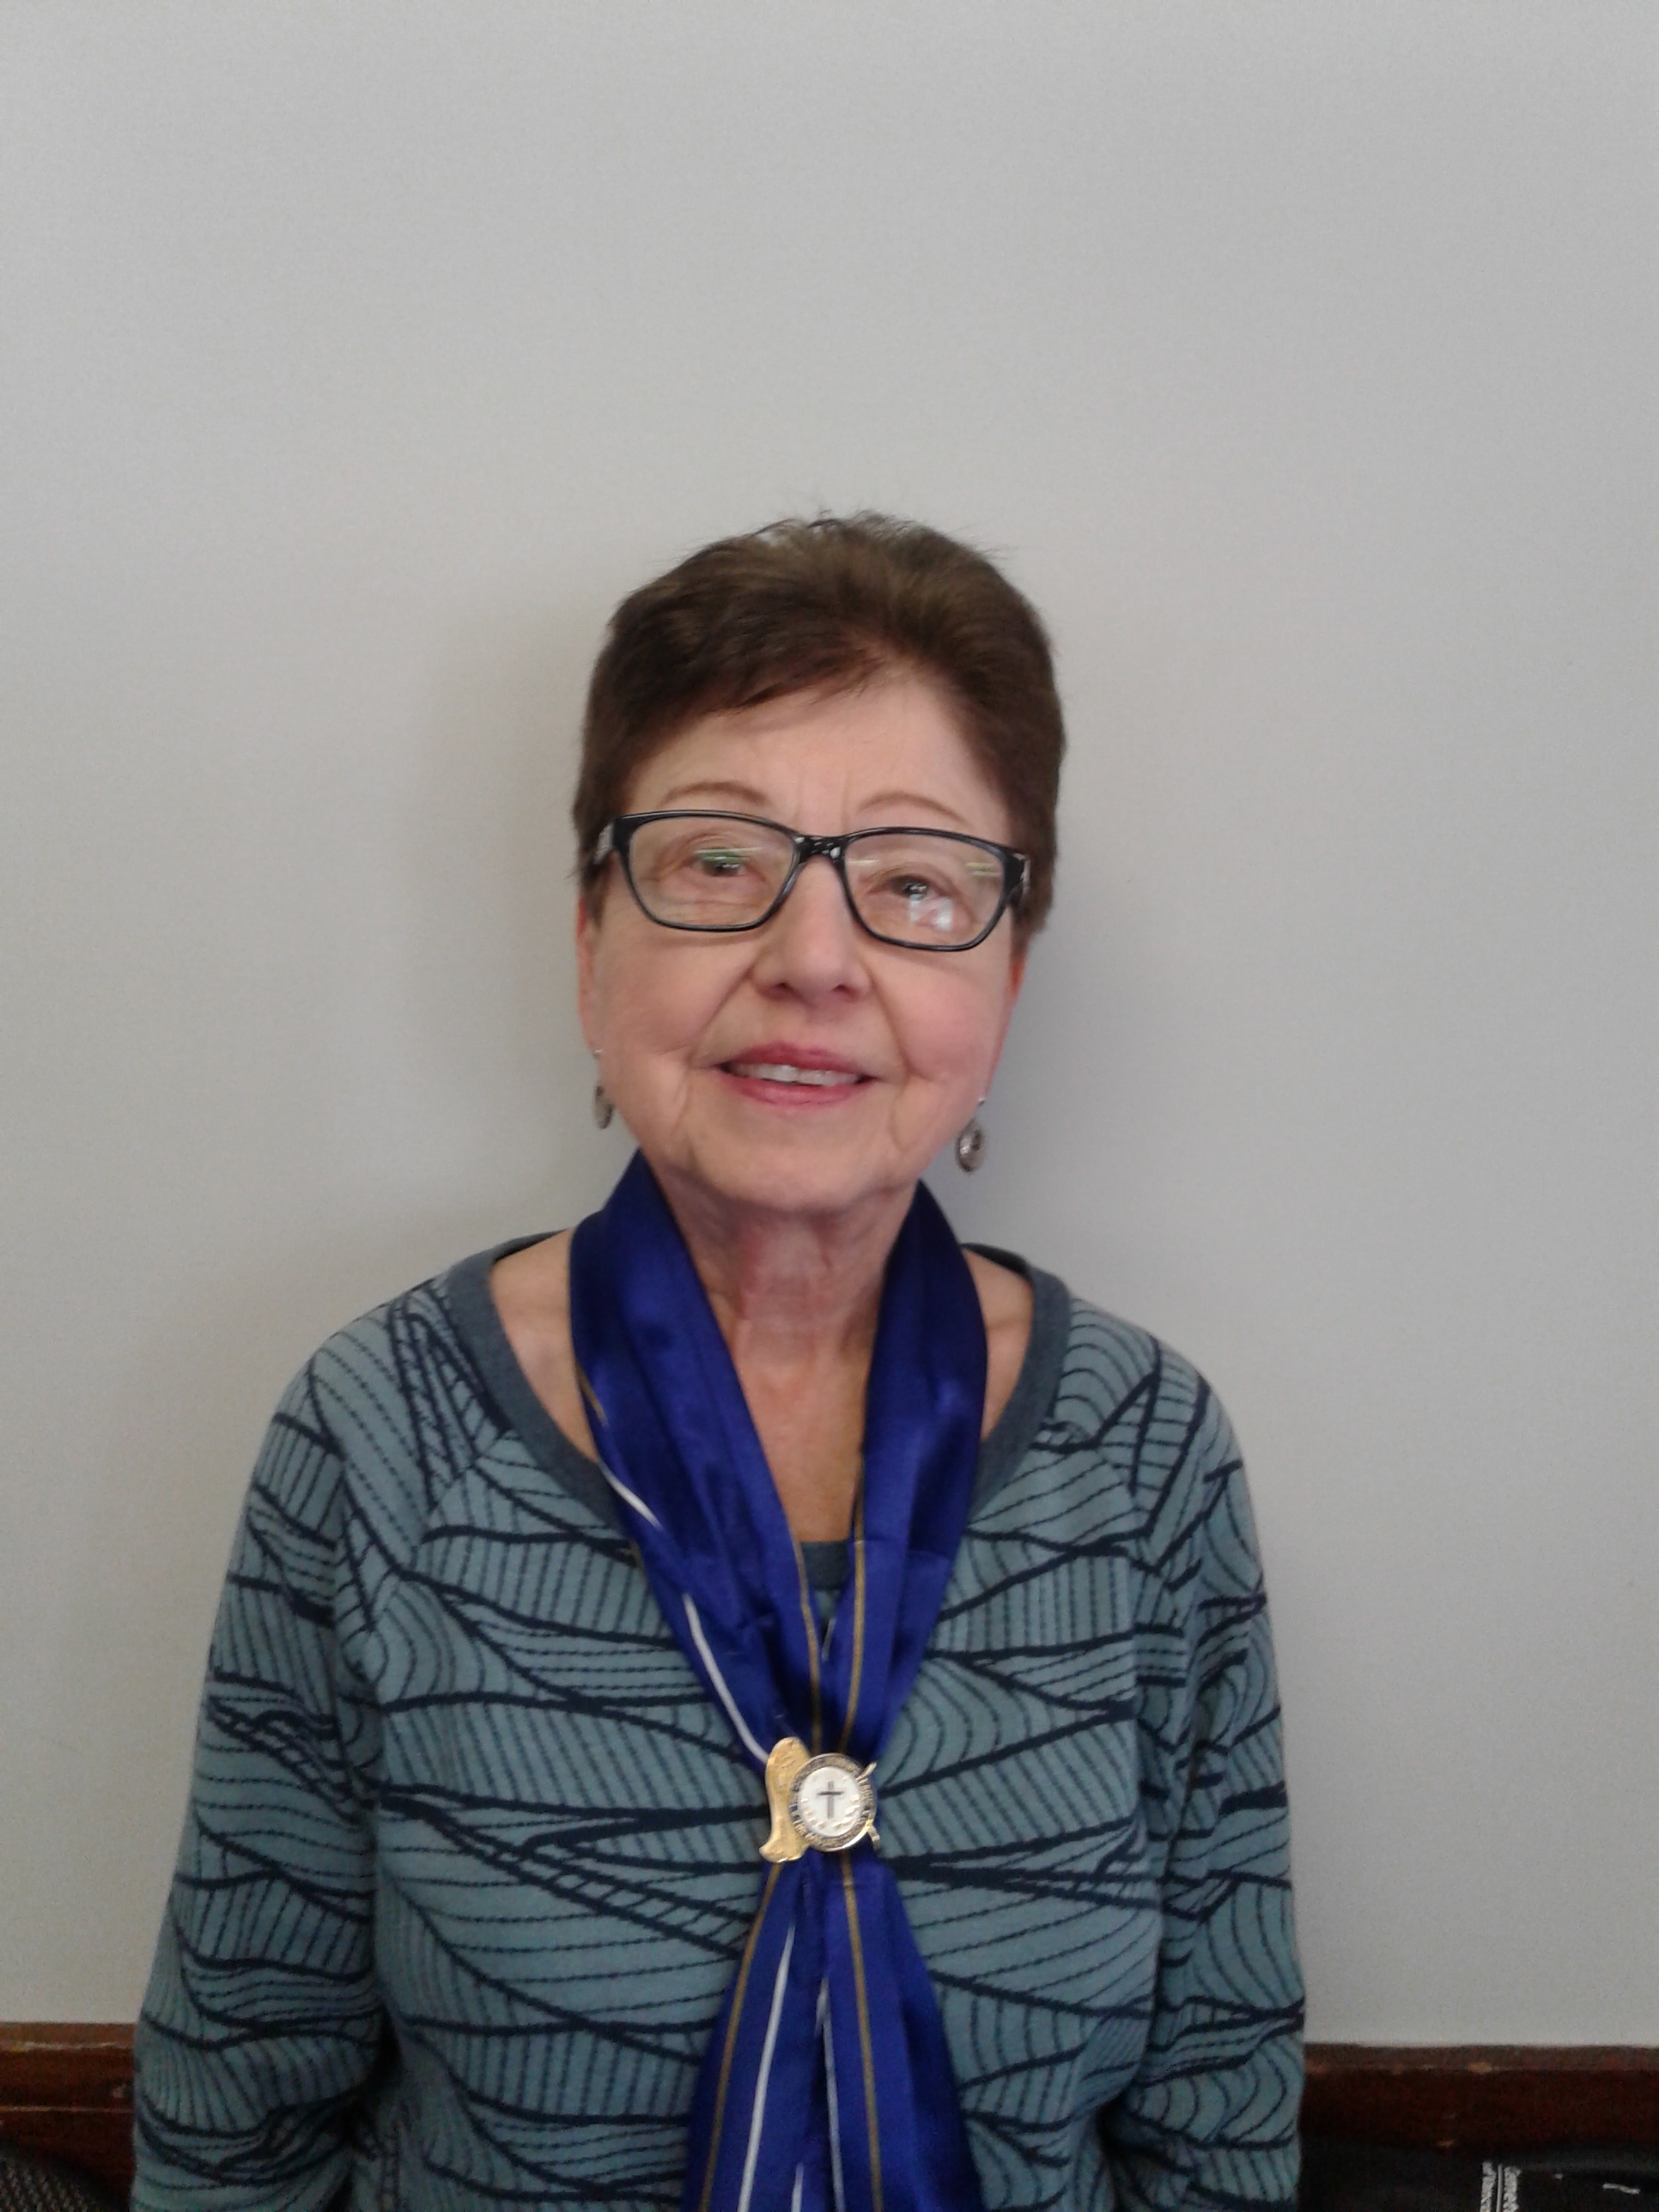 Odette Hucaluk